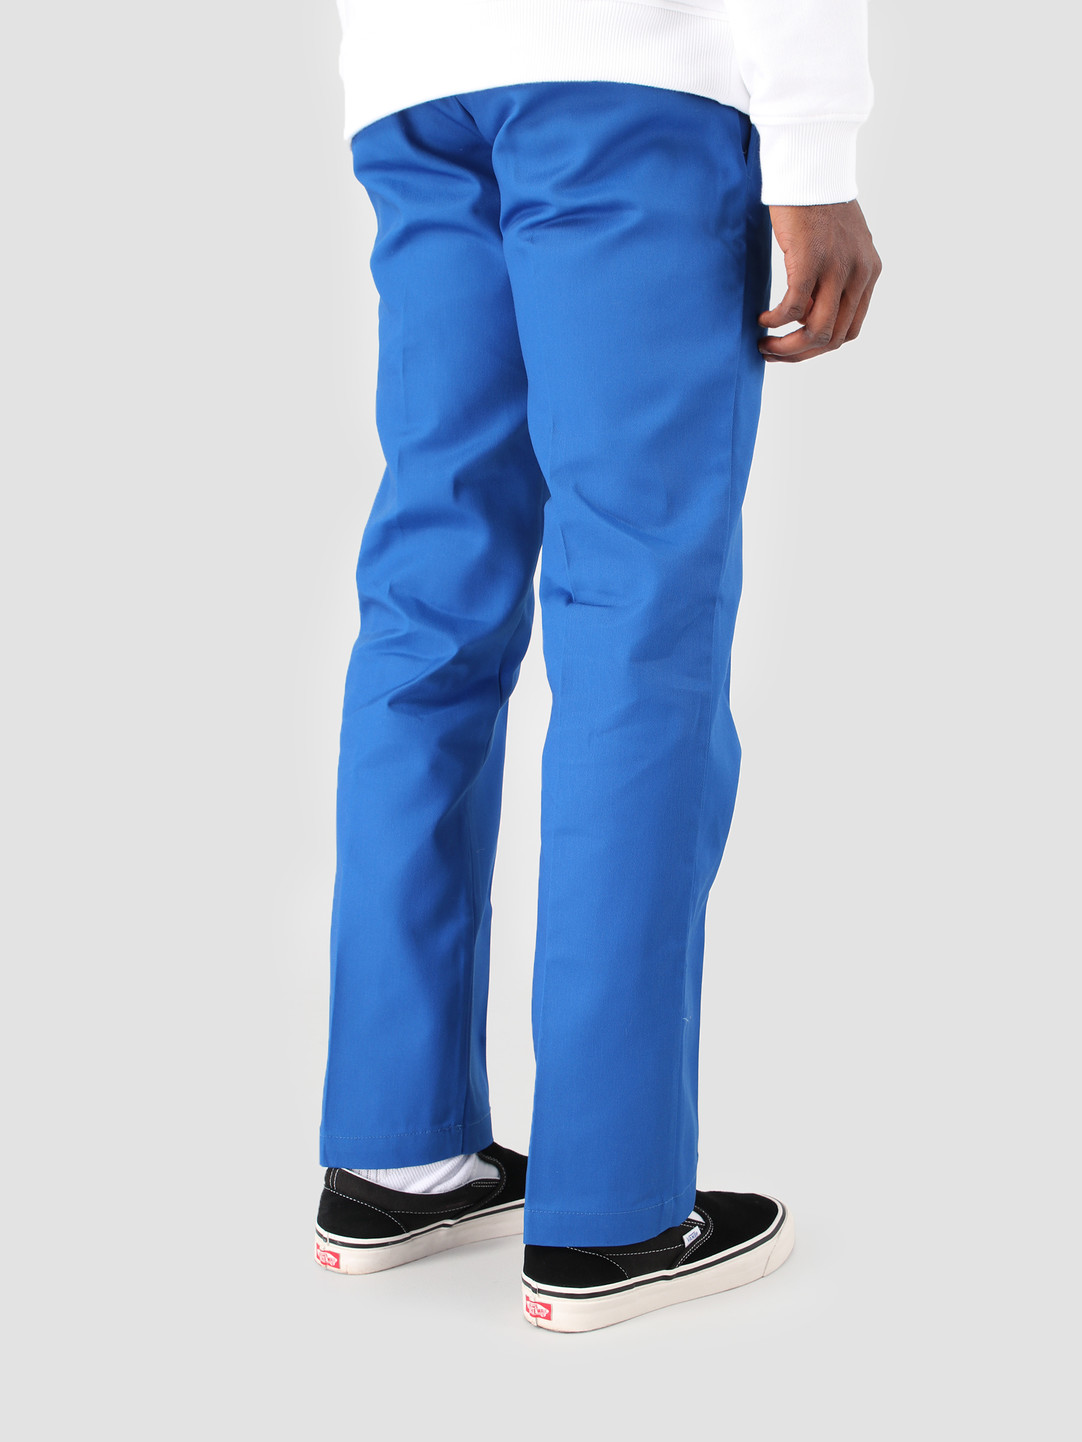 Dickies Dickies Straight Work Pant Royal Blue 2 WP873-BLL